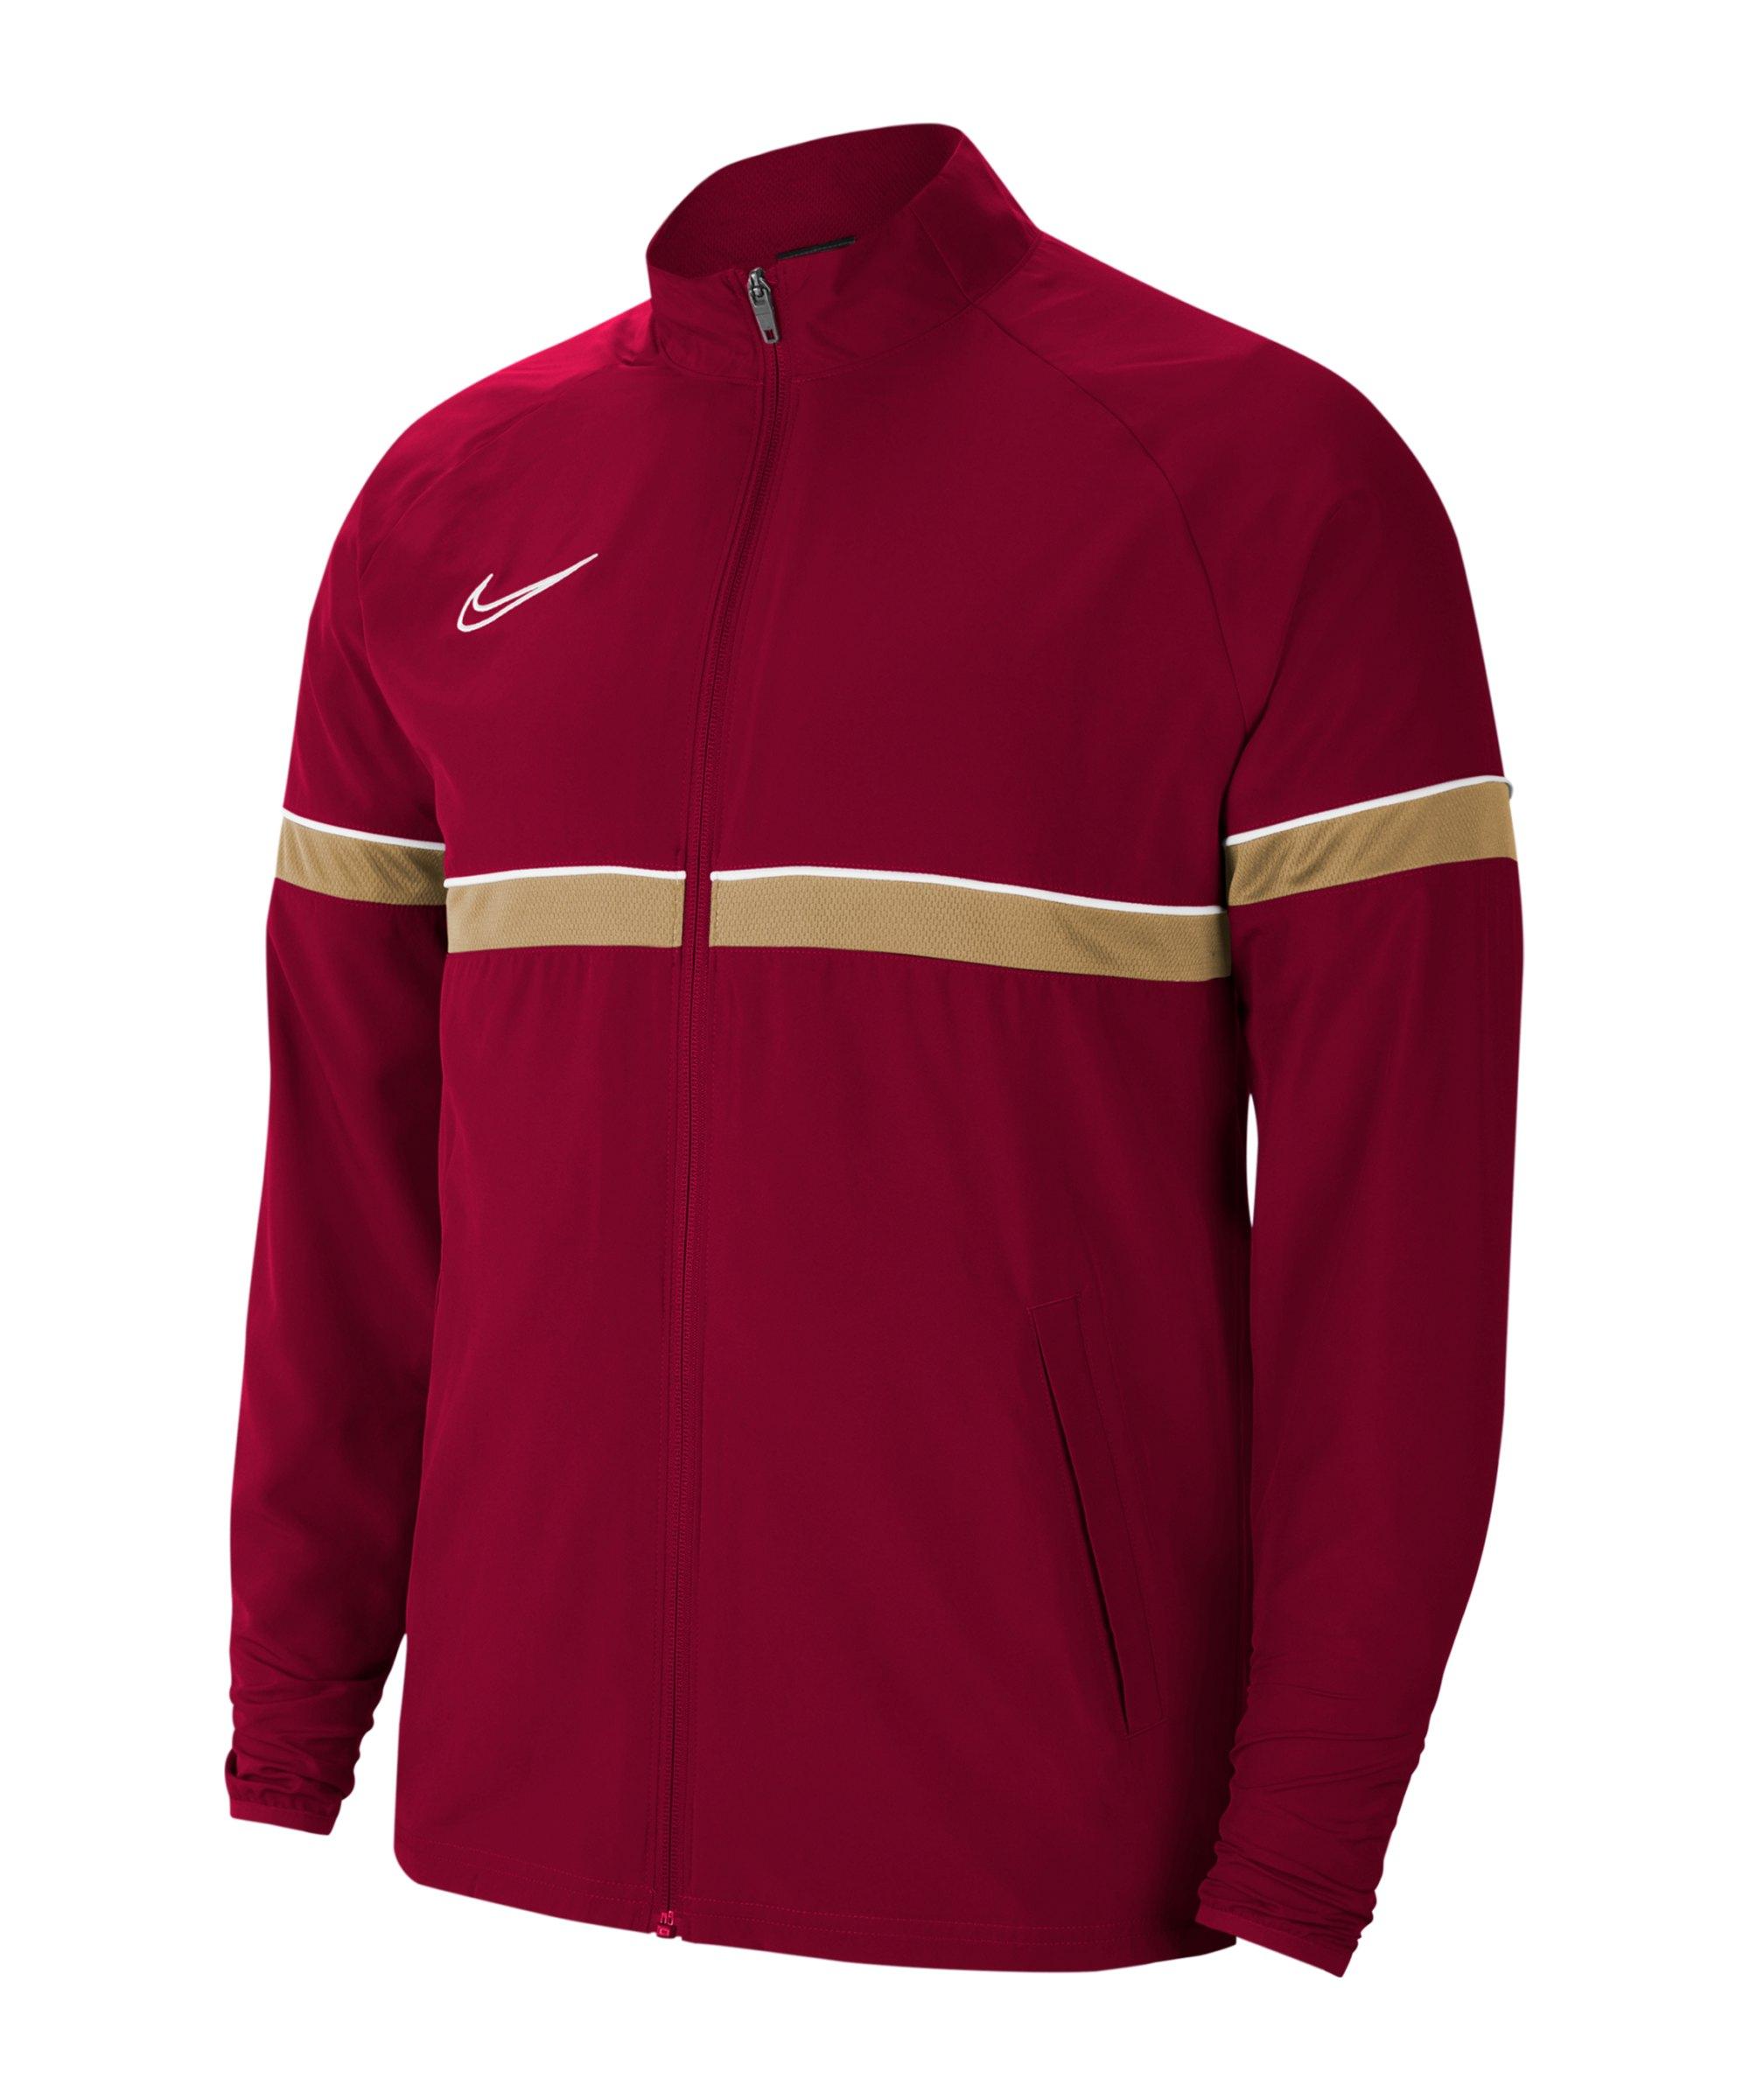 Nike Academy 21 Woven Trainingsjacke Kids Rot F677 - rot